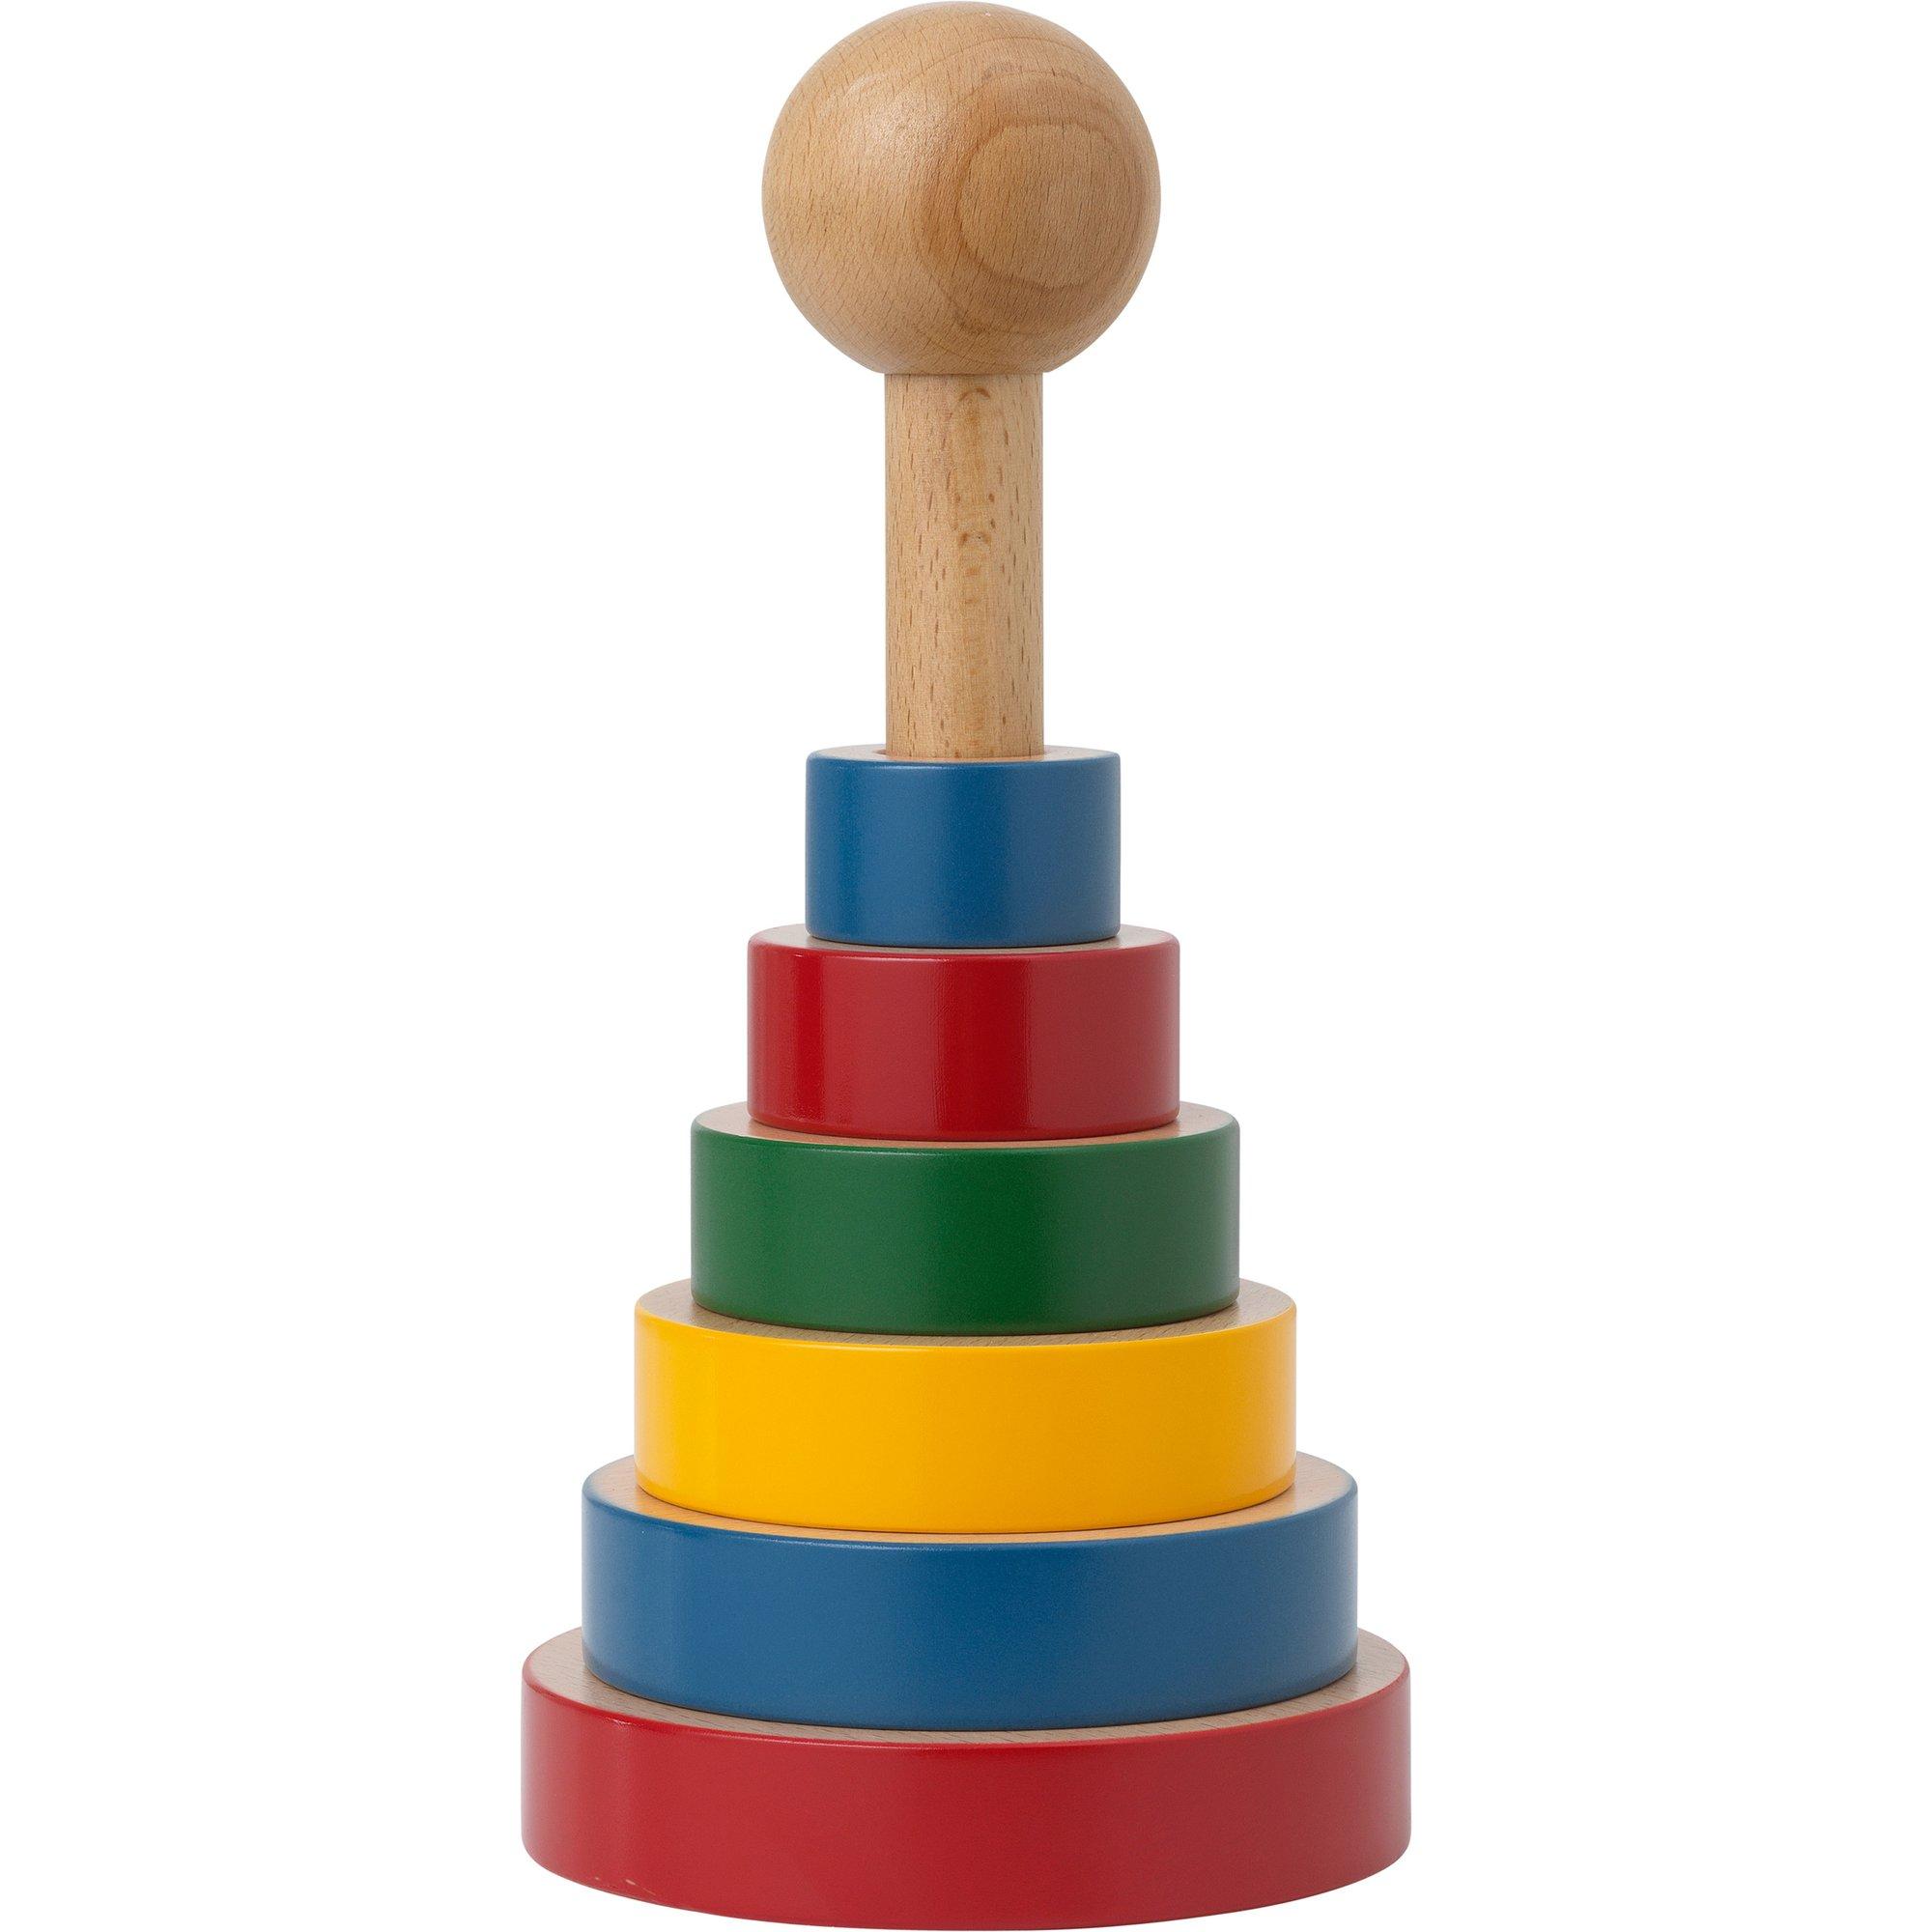 Kay Bojesen Pyramid Tower